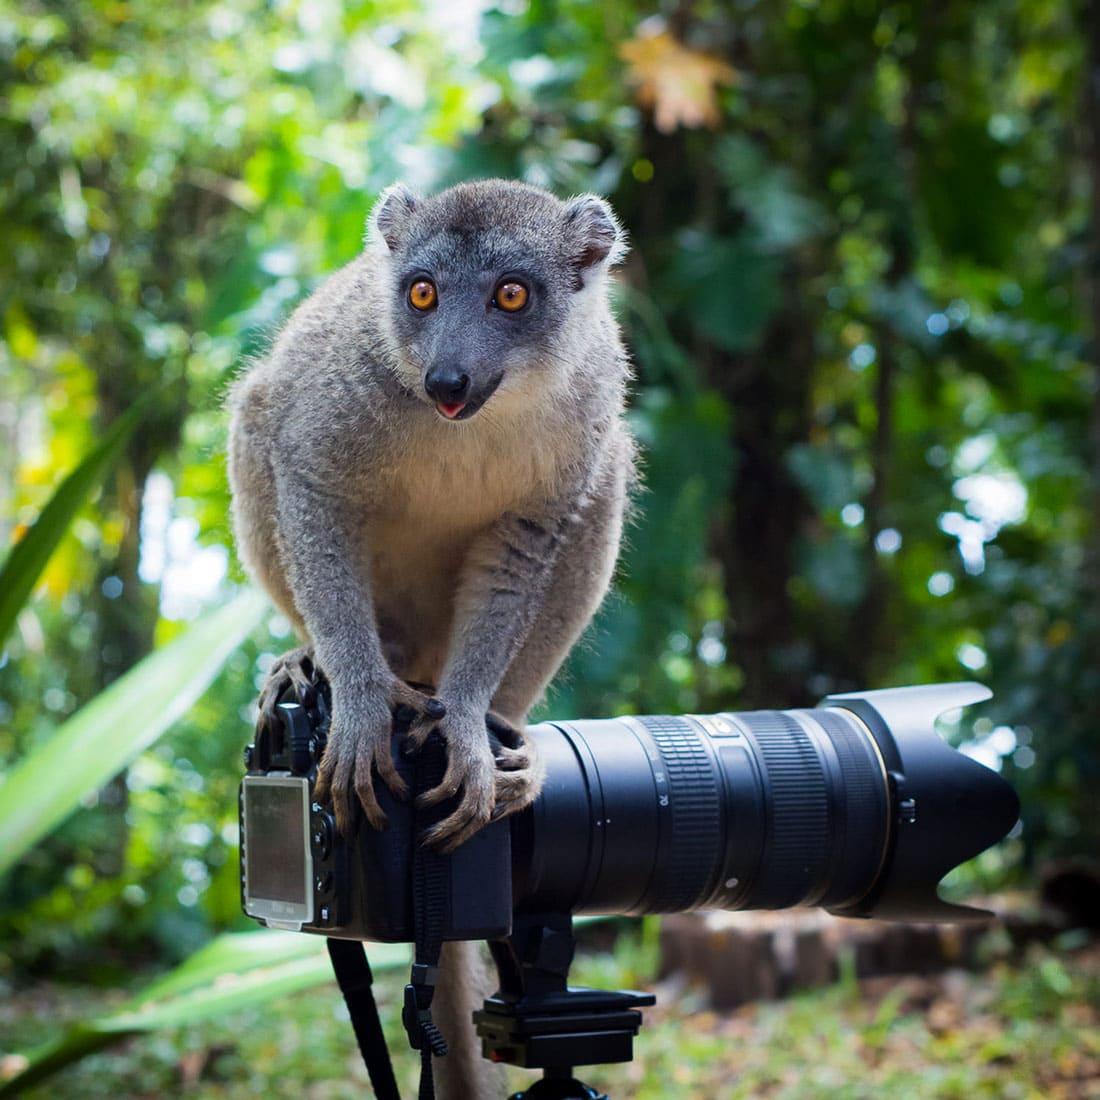 Brown lemur standing on a camera